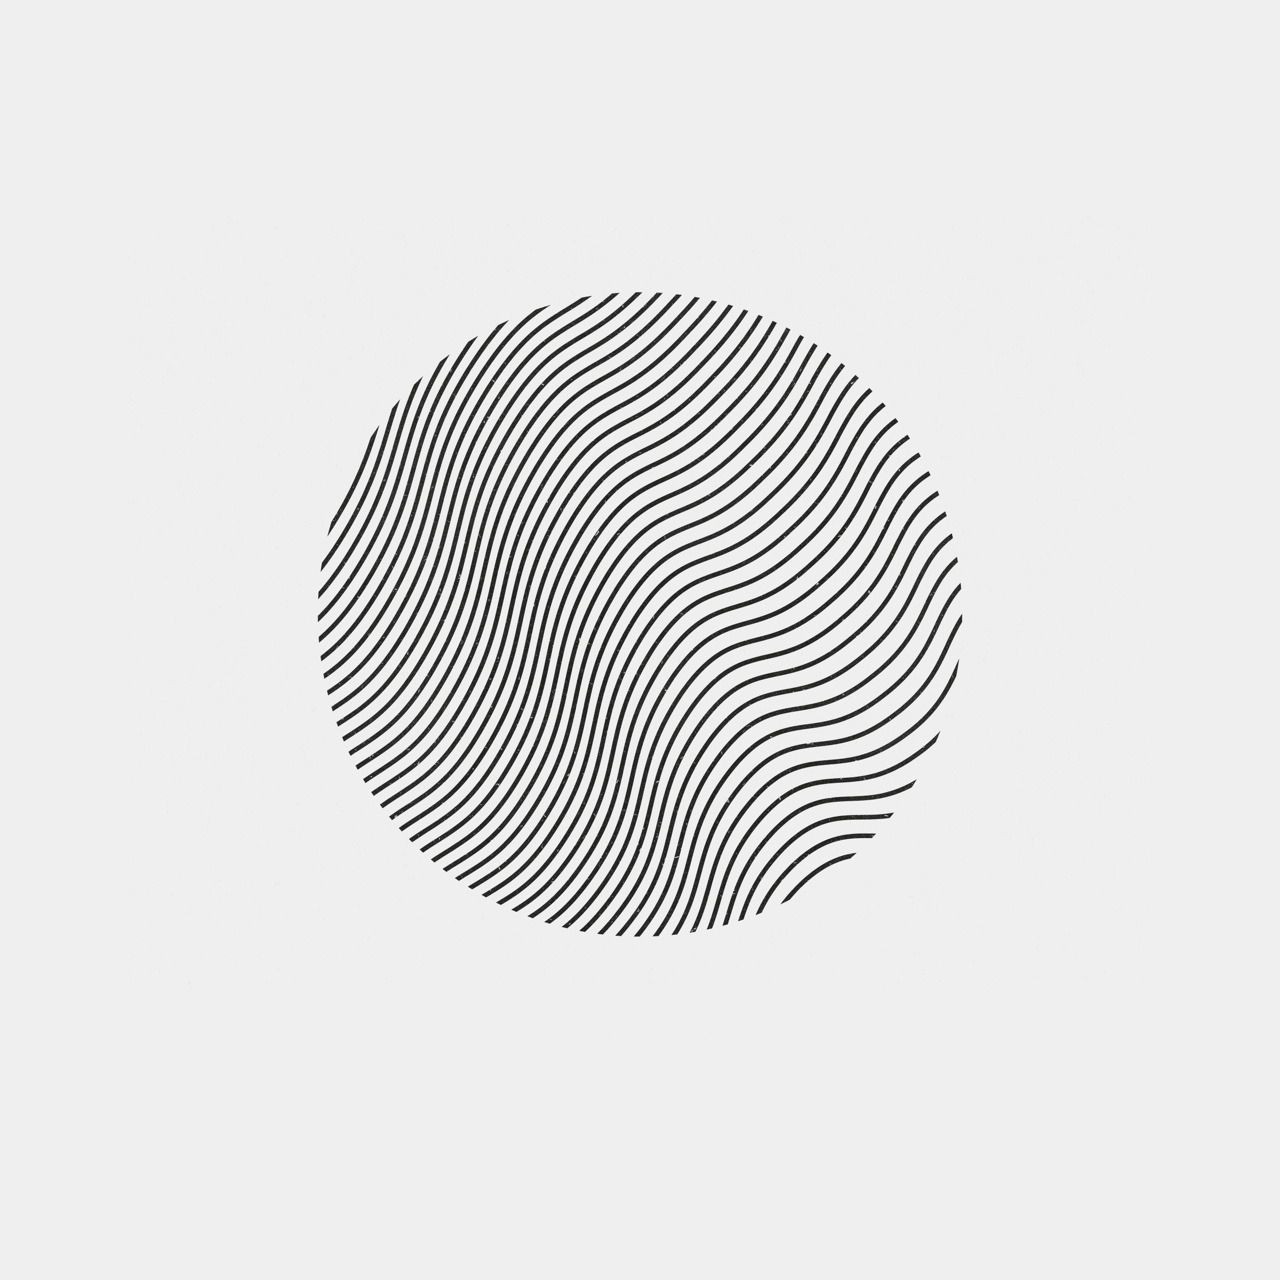 Art Of Geometry Art Abstract Minimalism Shapes Geometric Geometry Aesthetic Tattoo Inspiration Black And White De Geometric Circle Geometry Abstract